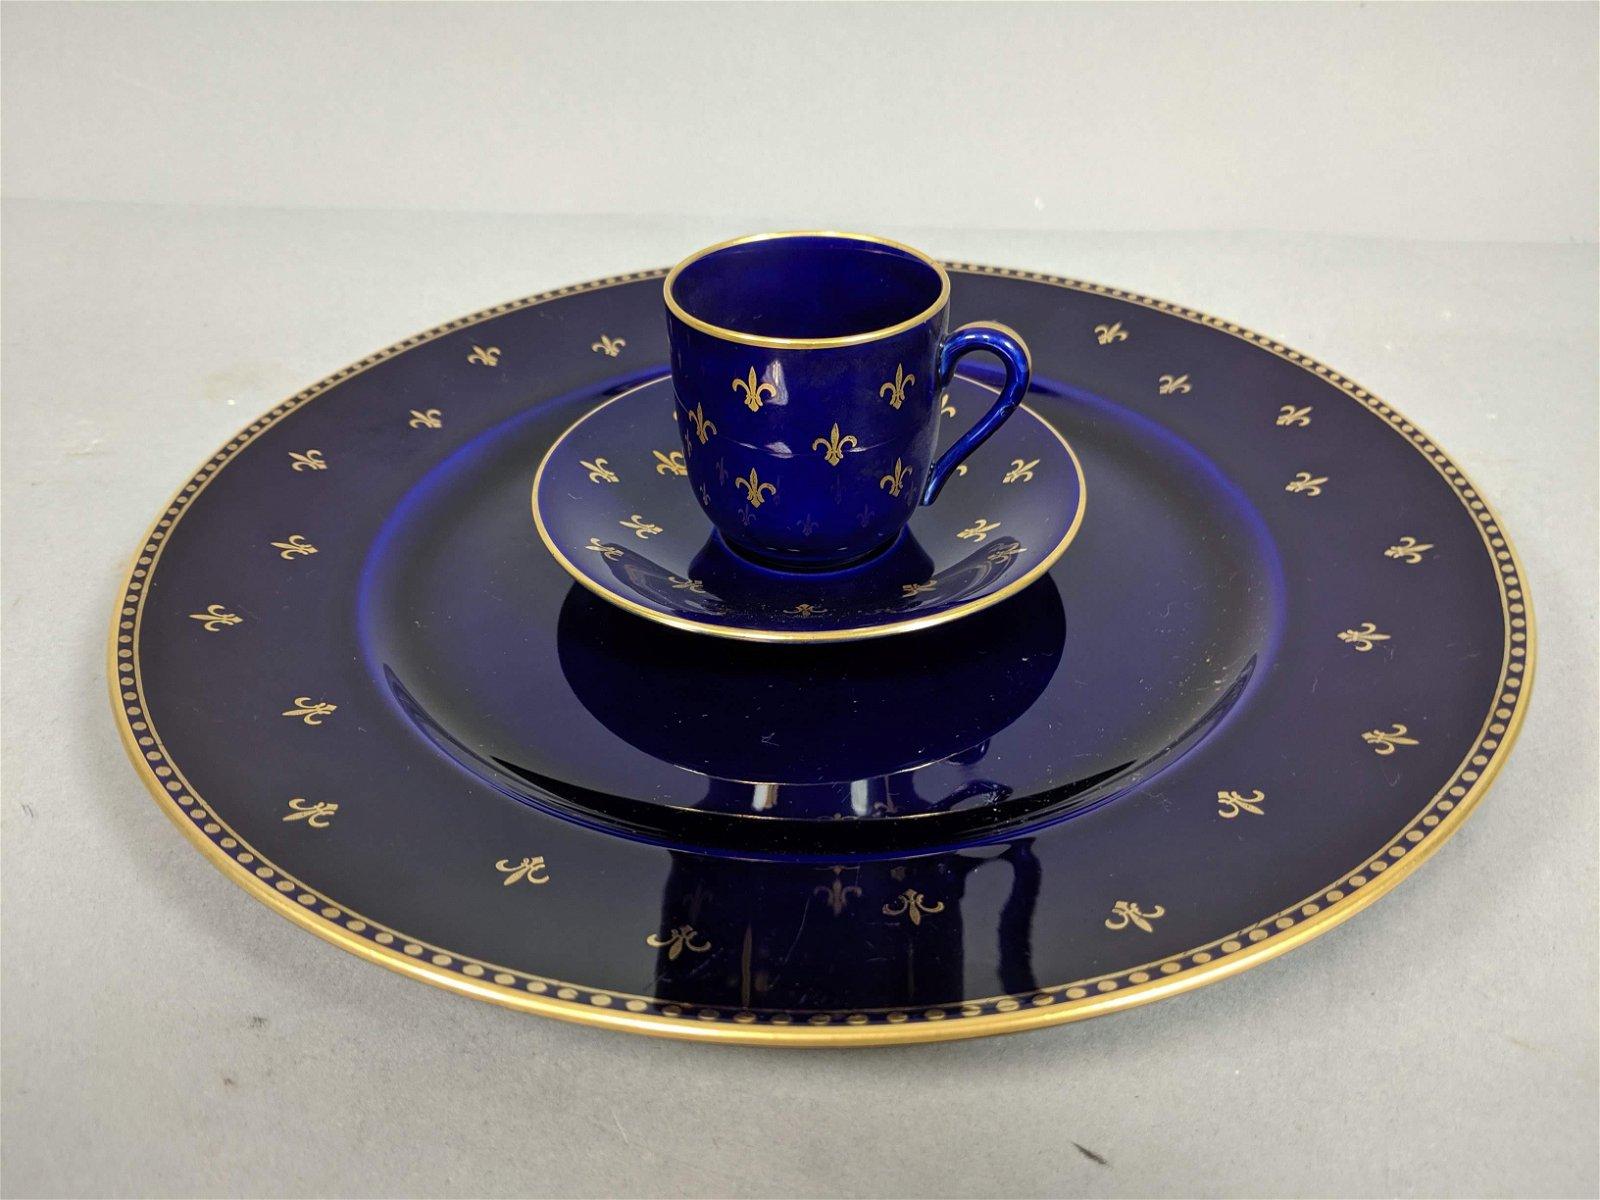 RORSTRAND Sweden Set of Porcelain China. Cobalt,